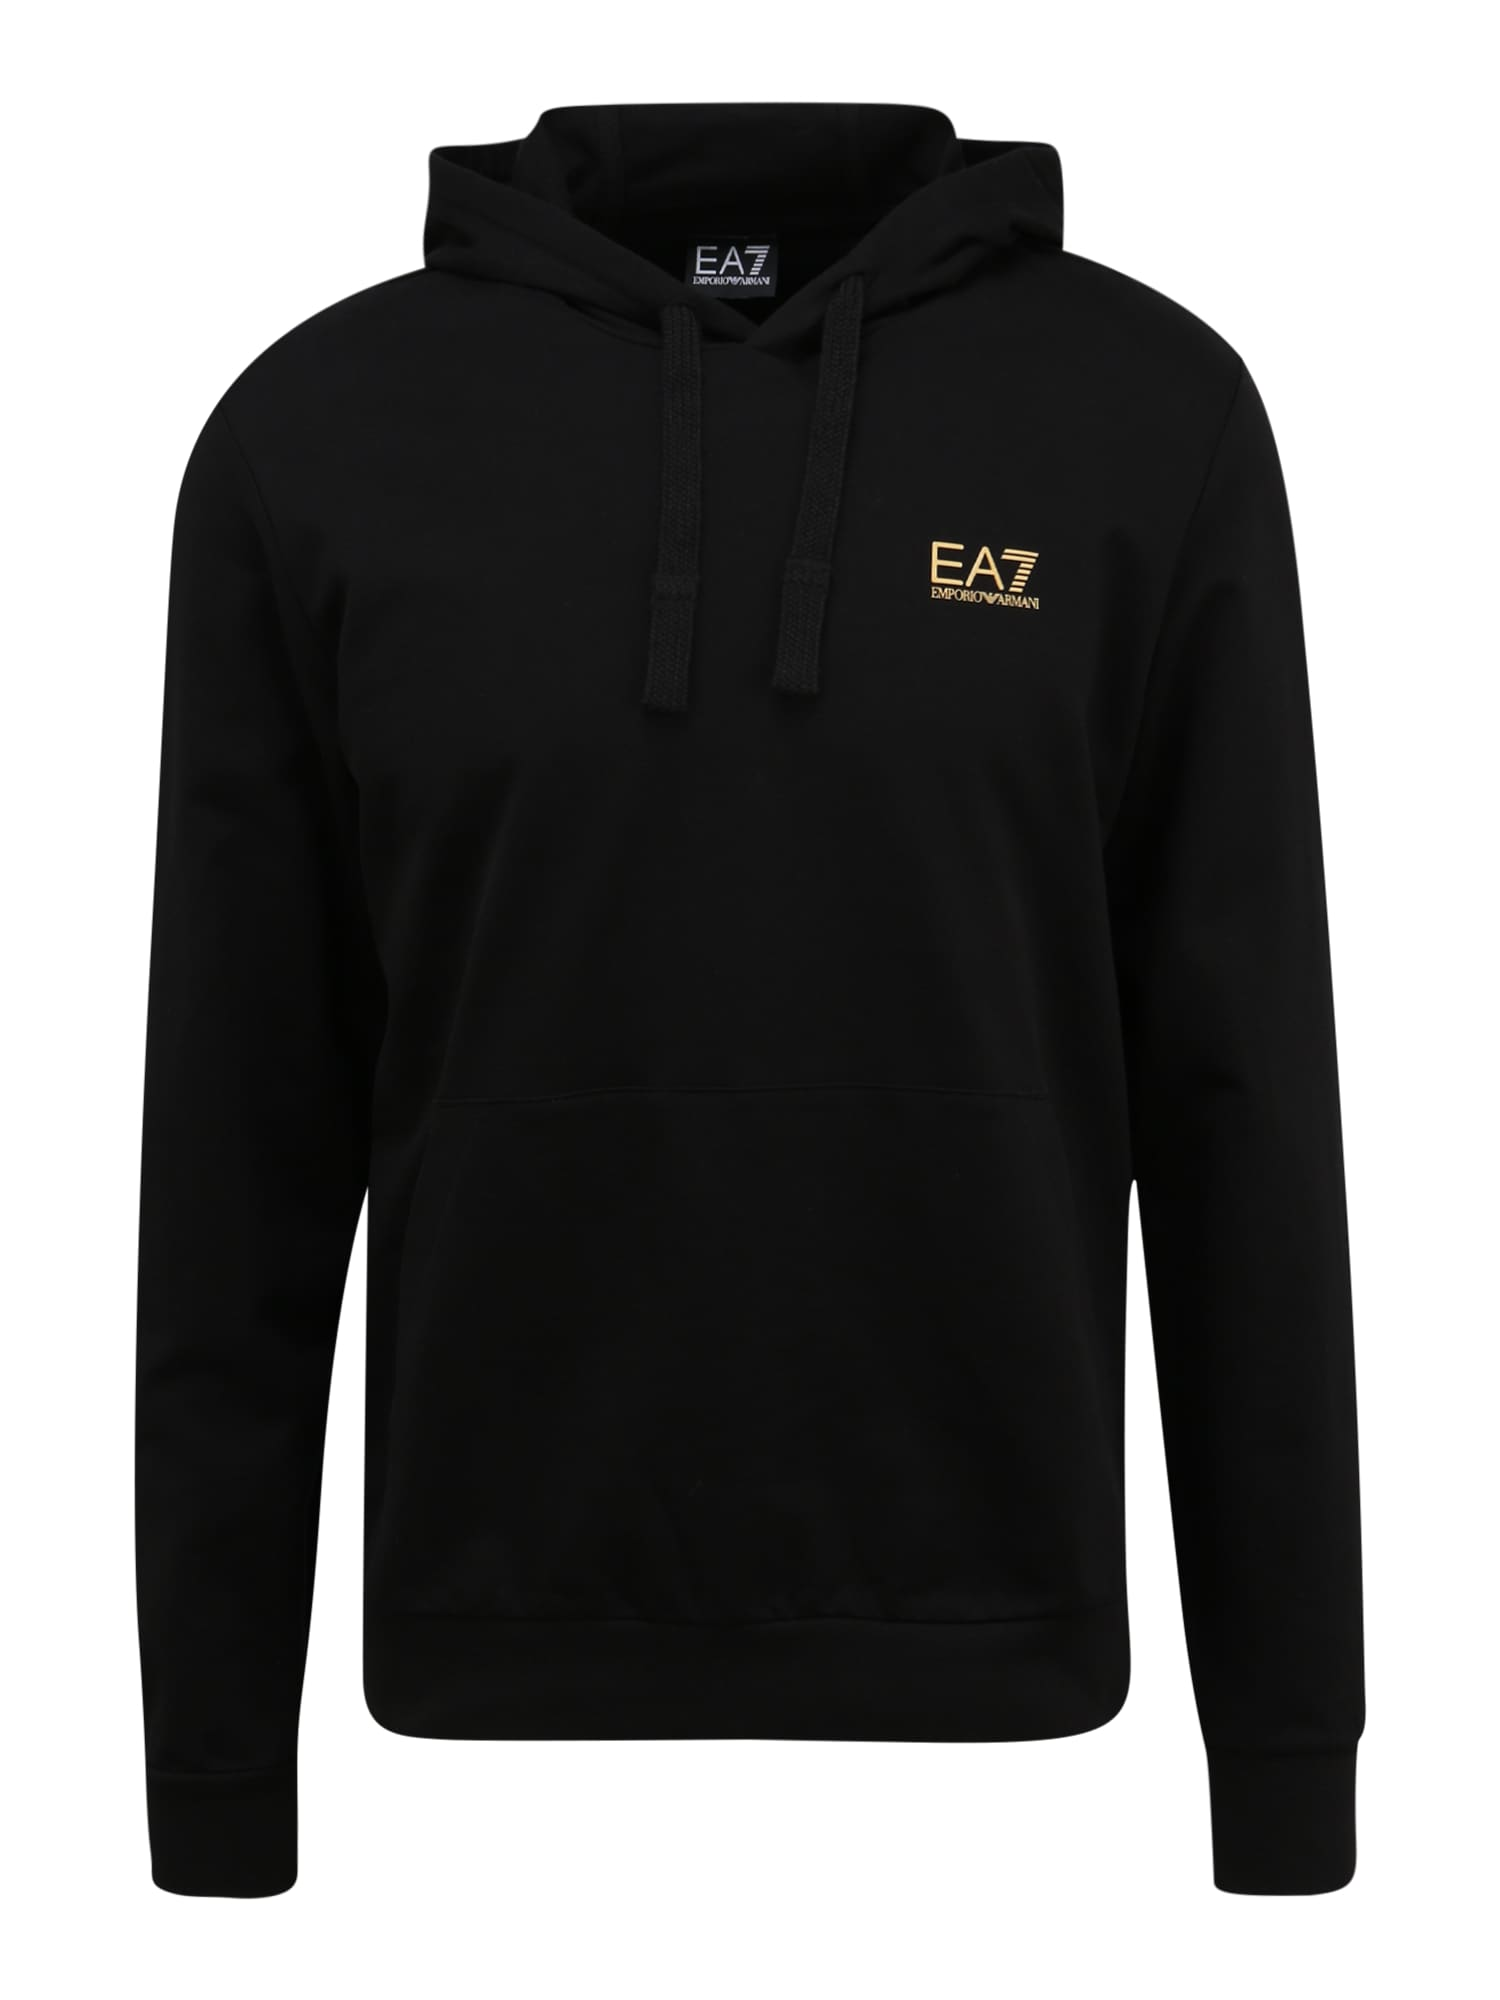 EA7 Emporio Armani Megztinis be užsegimo juoda / aukso geltonumo spalva